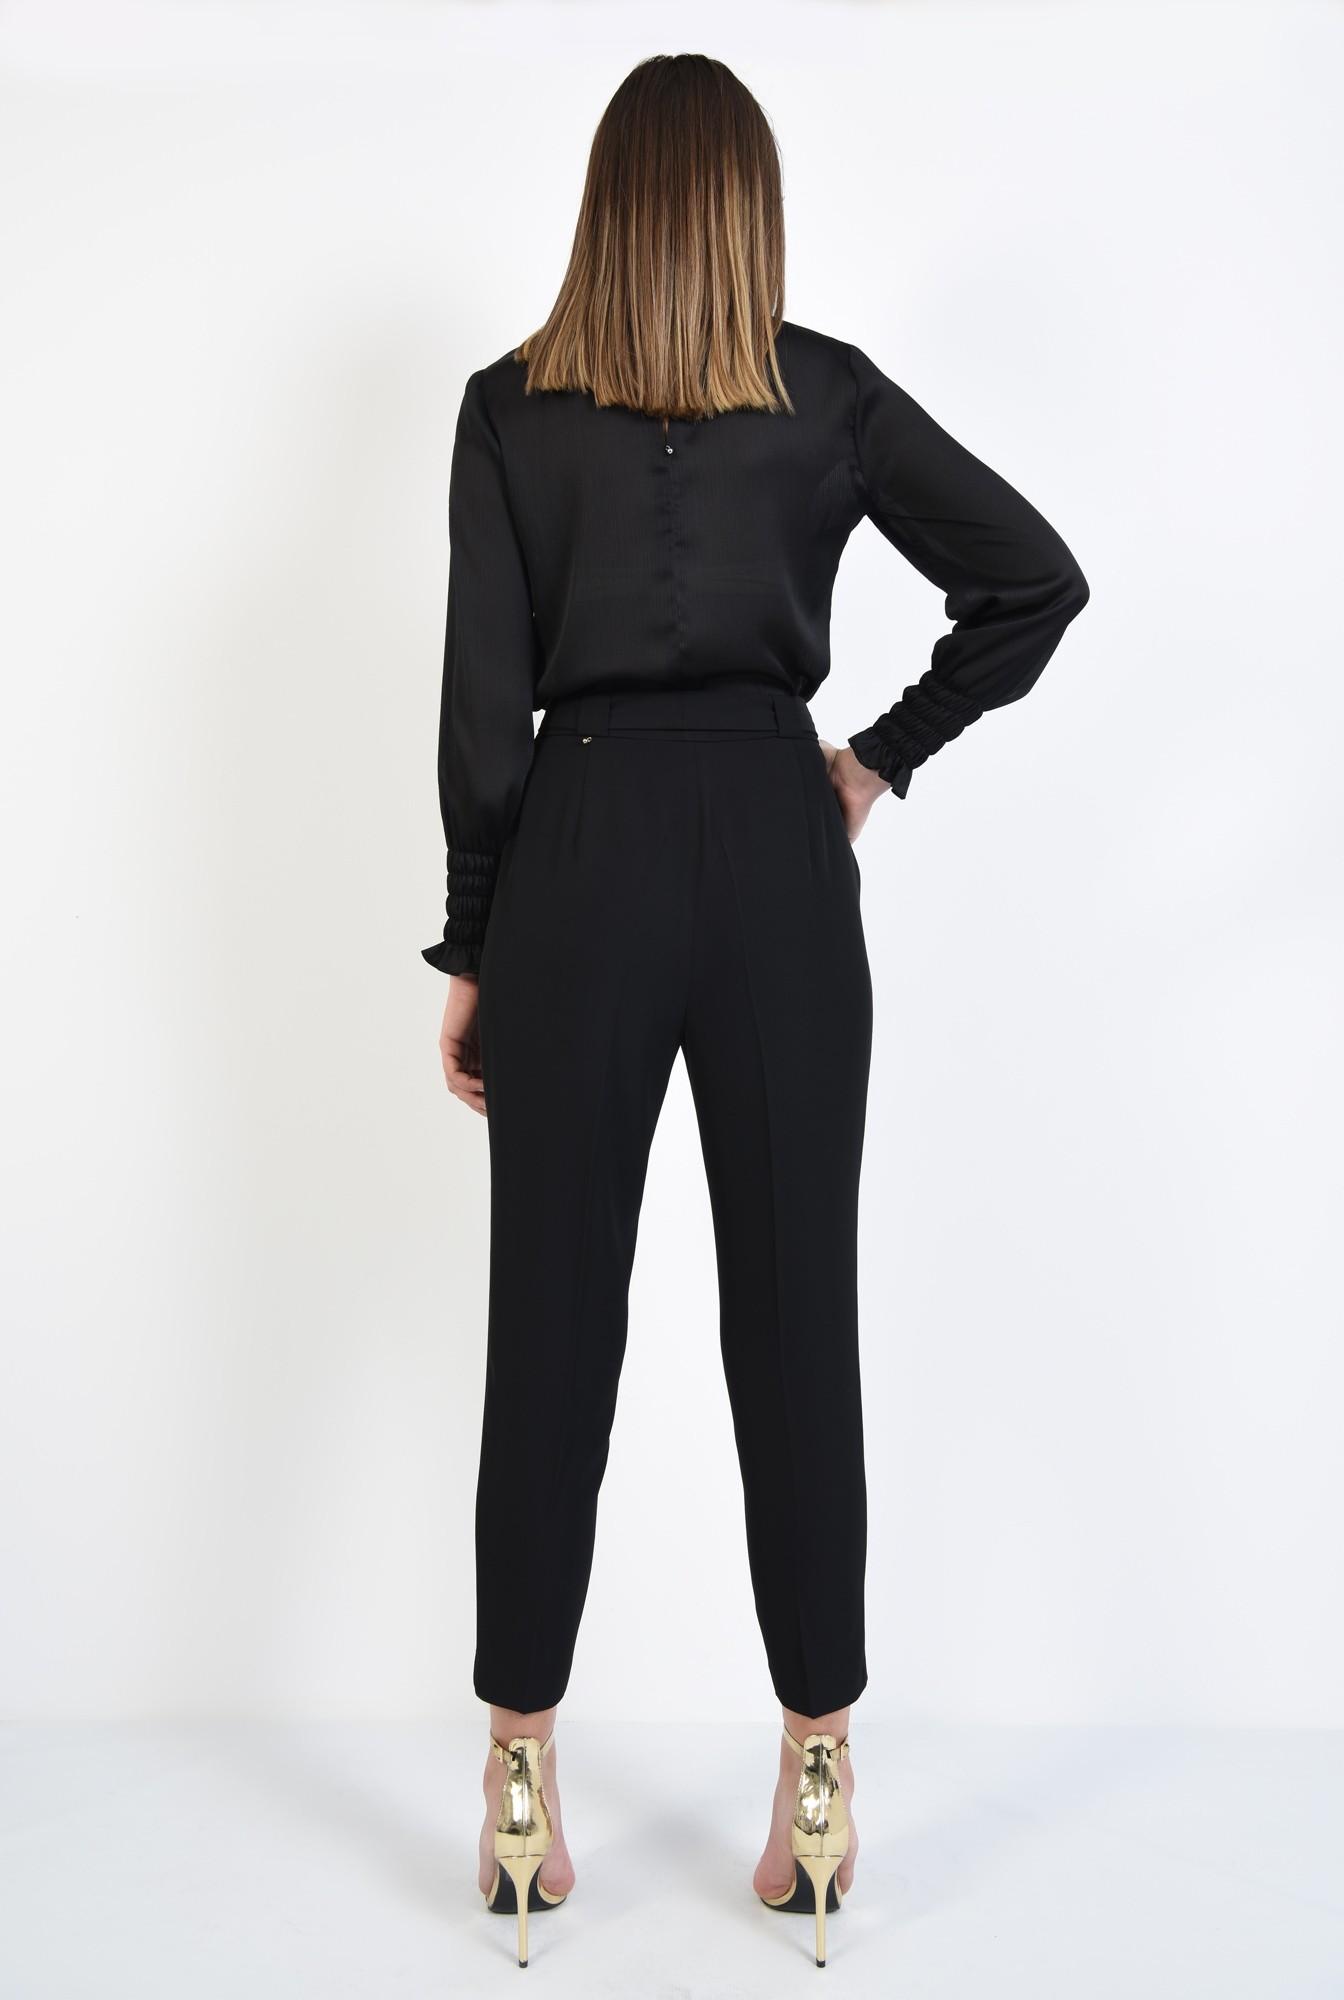 1 - pantaloni tigareta, cu talie inalta, cu cordon, croi conic